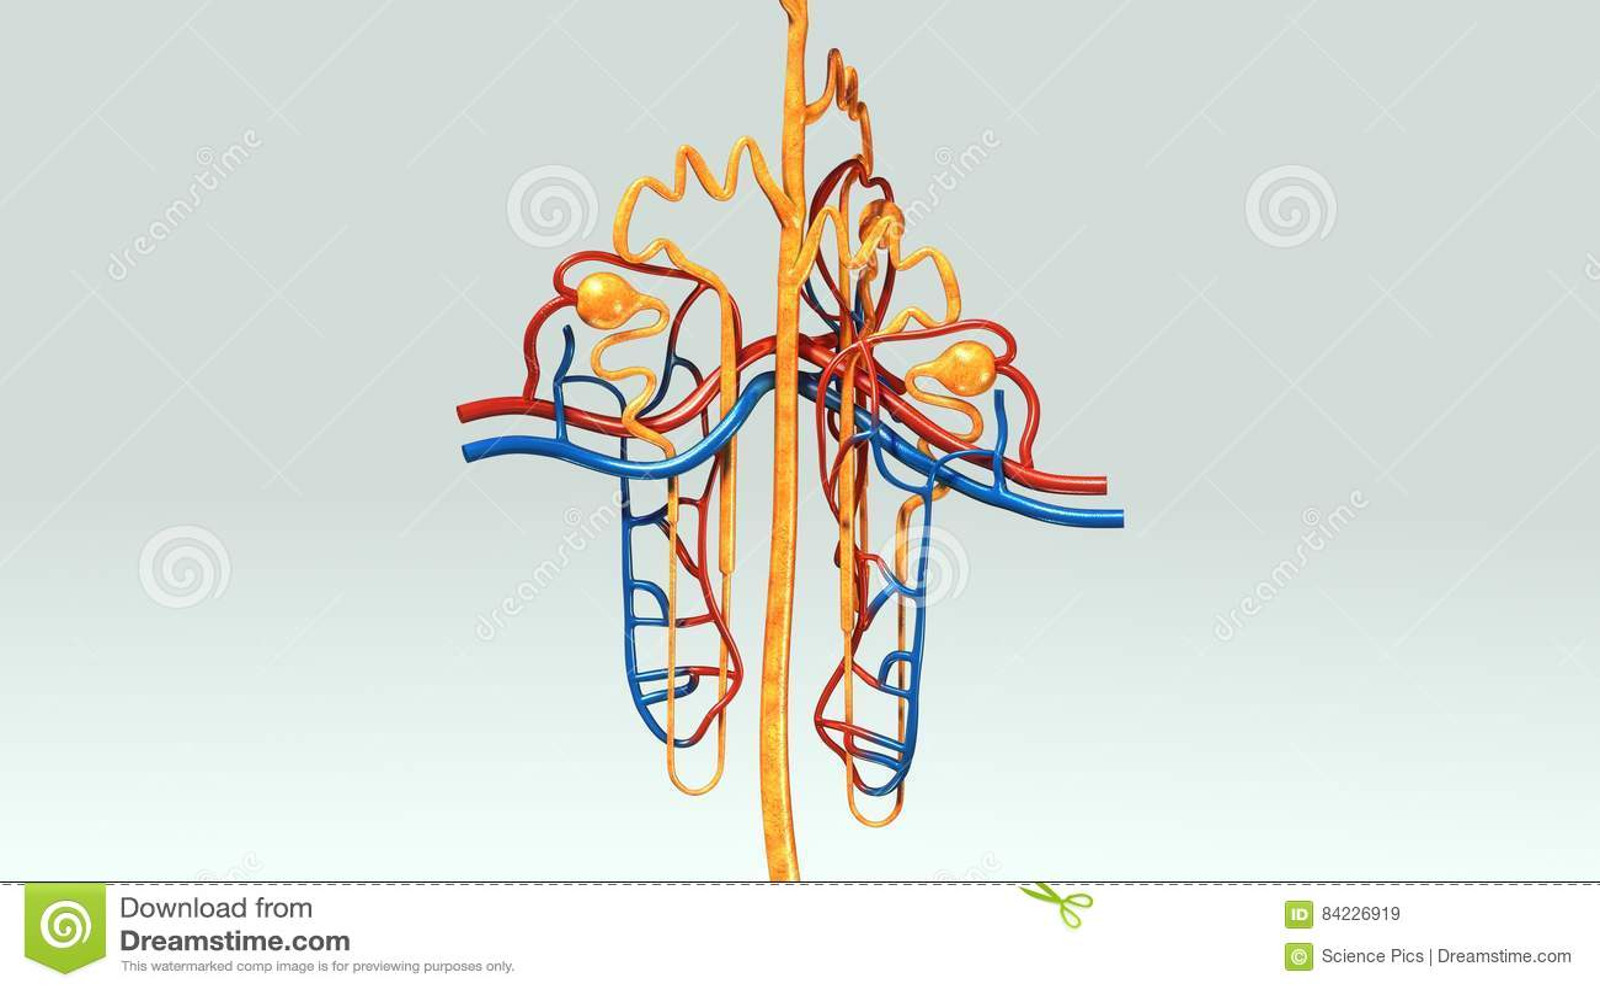 Nephron stock illustration. Illustration of diagnosis - 84226919